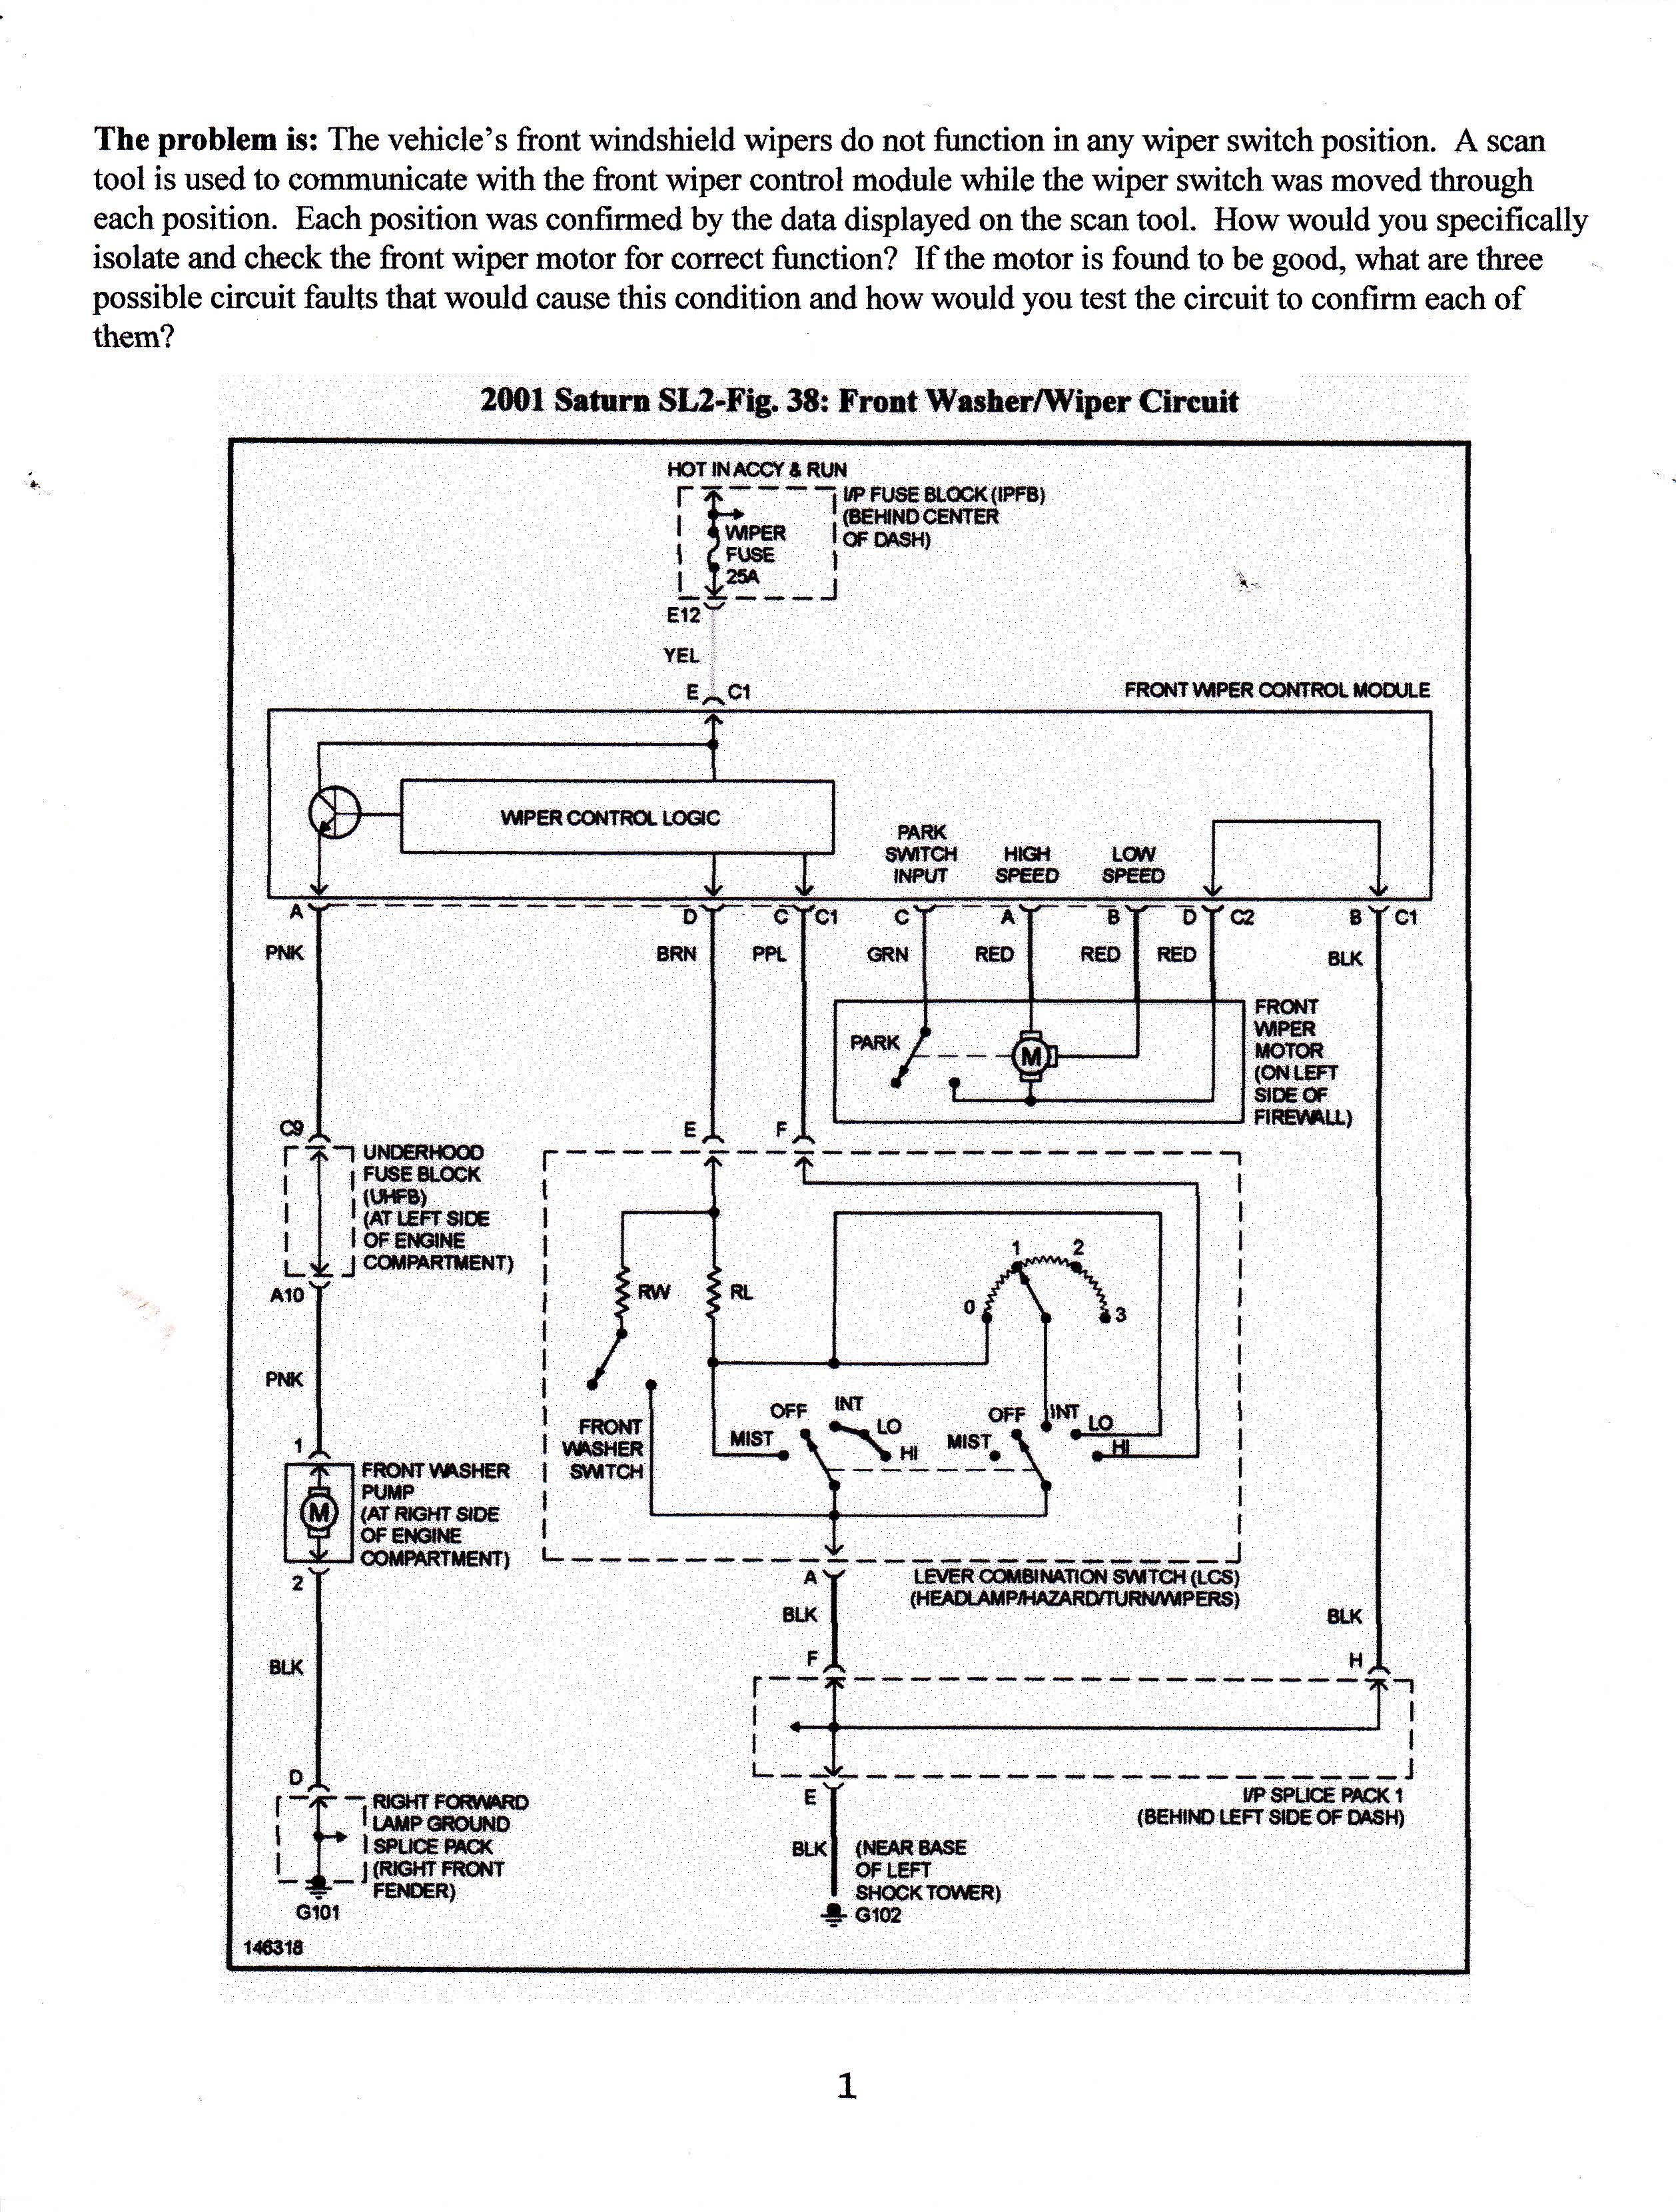 2001 saturn l200 fuse box diagram wiring diagrams 2002 saturn l100 2002  saturn l series fuse